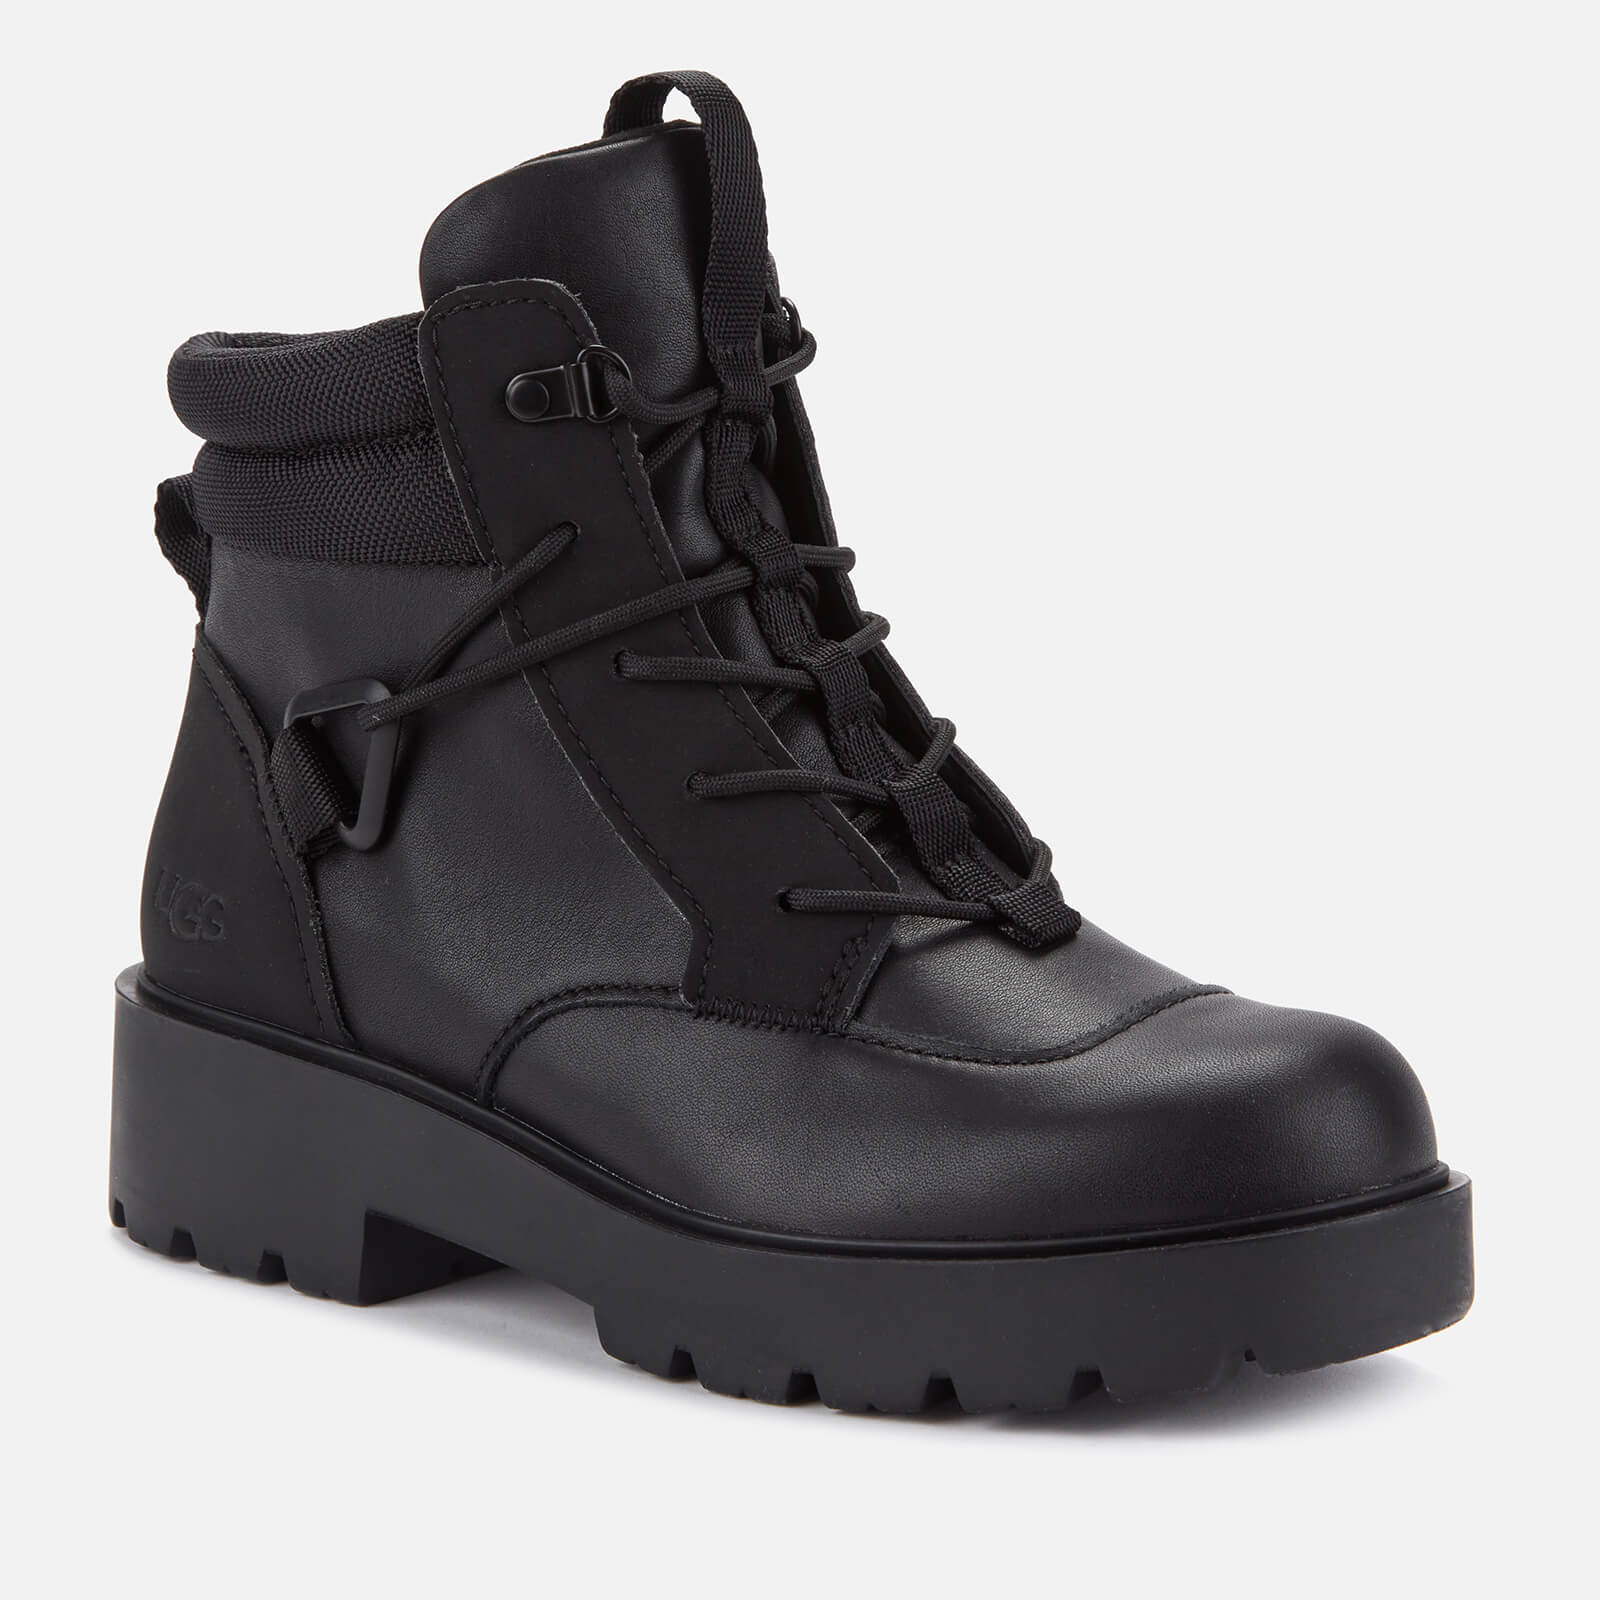 Ugg Women's Tioga Waterproof Leather Hiking Style Boots - Black - Uk 3